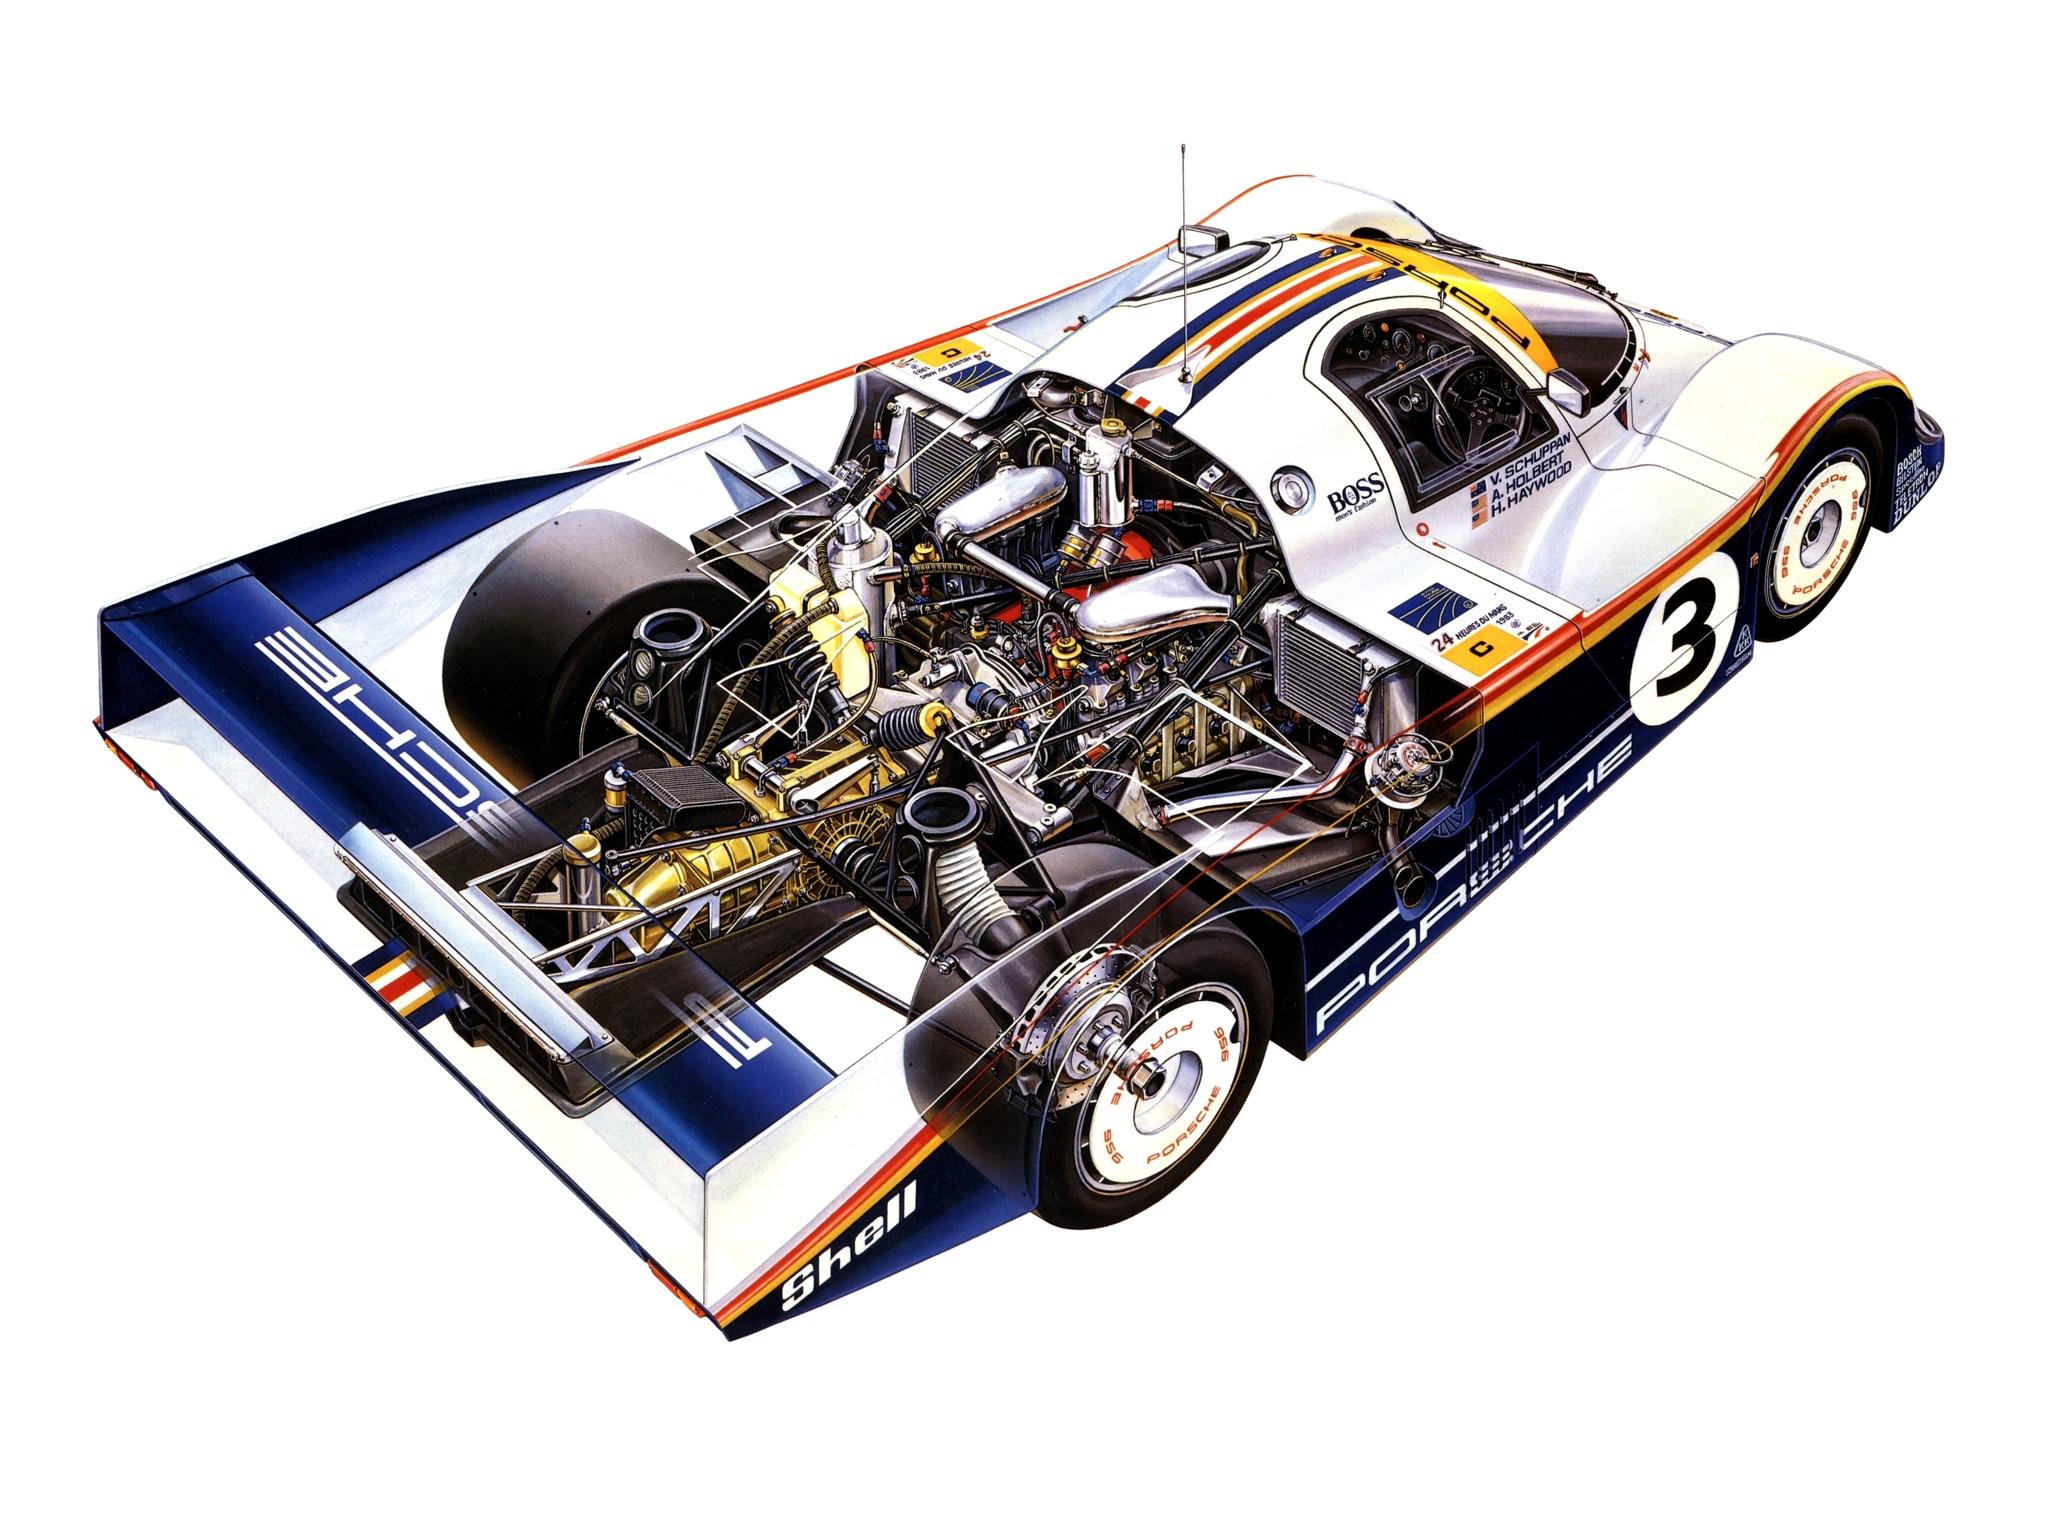 1983 porsche 956 c coupe classic race racing engine engines wallpaper 2048x1536 115163 - Porsche engine wallpaper ...